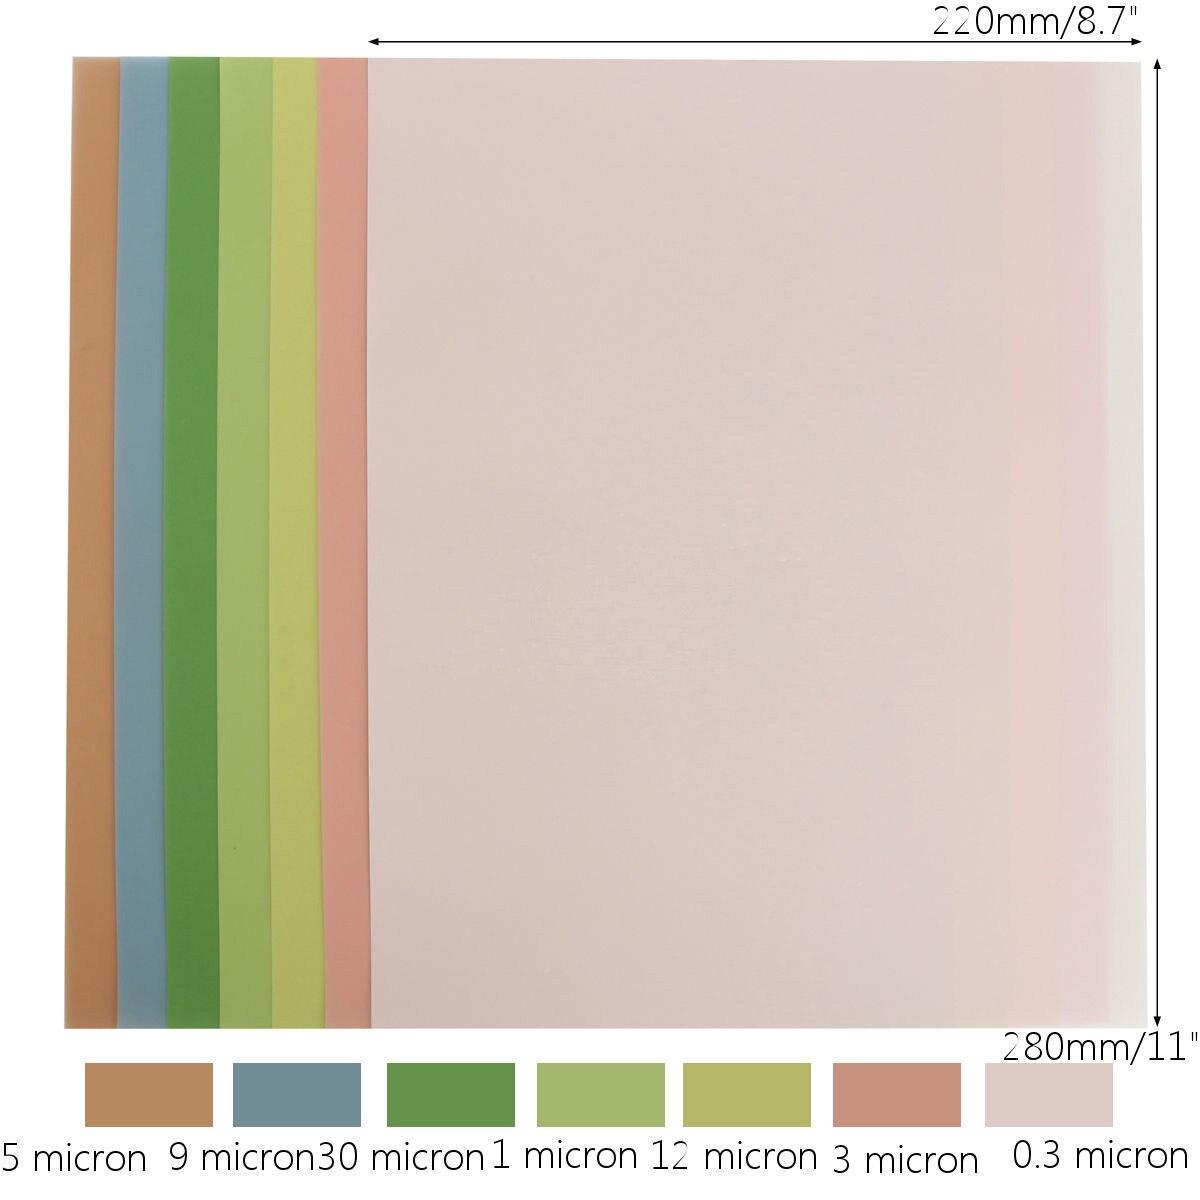 Fine Polishing 7PCS Colorful  Lapping Film Sheets 1500-12000 Grits Abrasive Tool